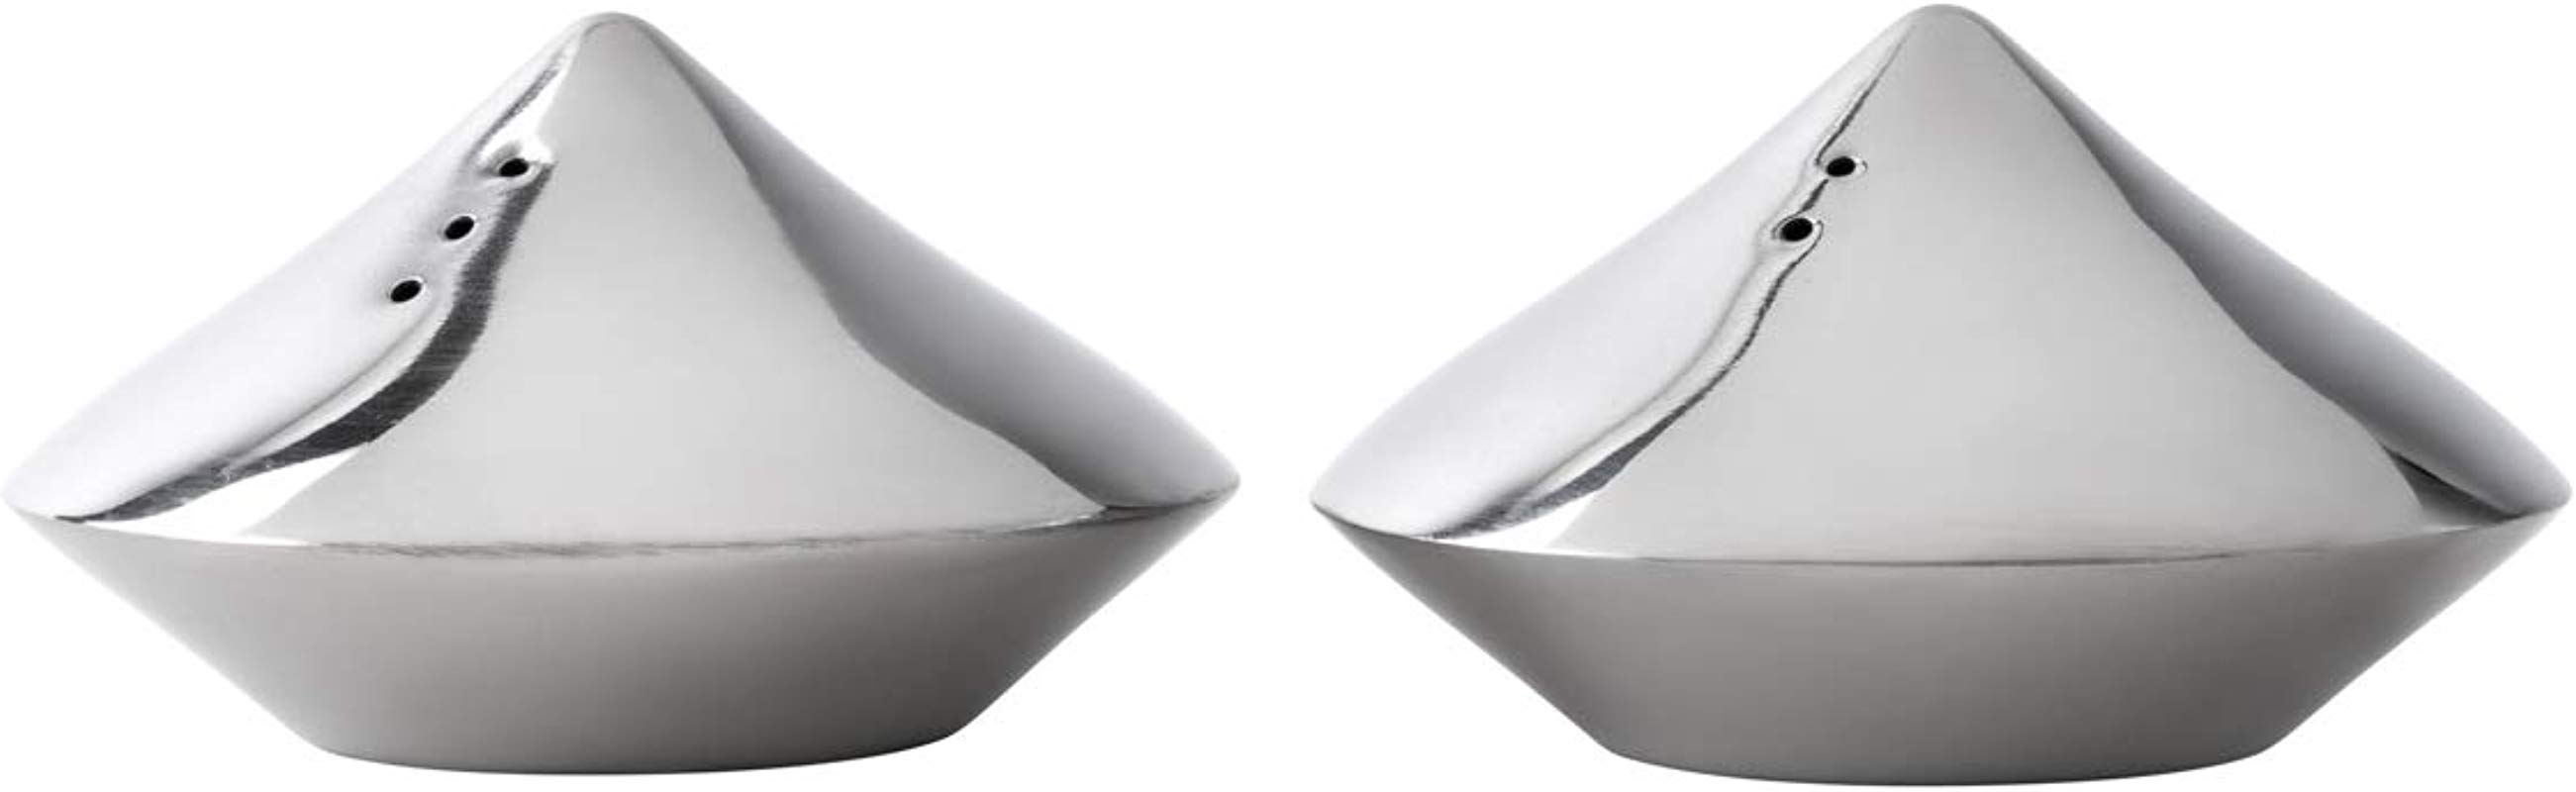 A La Mode ALM 666 Stainless Steel 2 3 4 X 1 3 4 Salt Pepper Shakers Pyramide Design Condiment Shaker Set